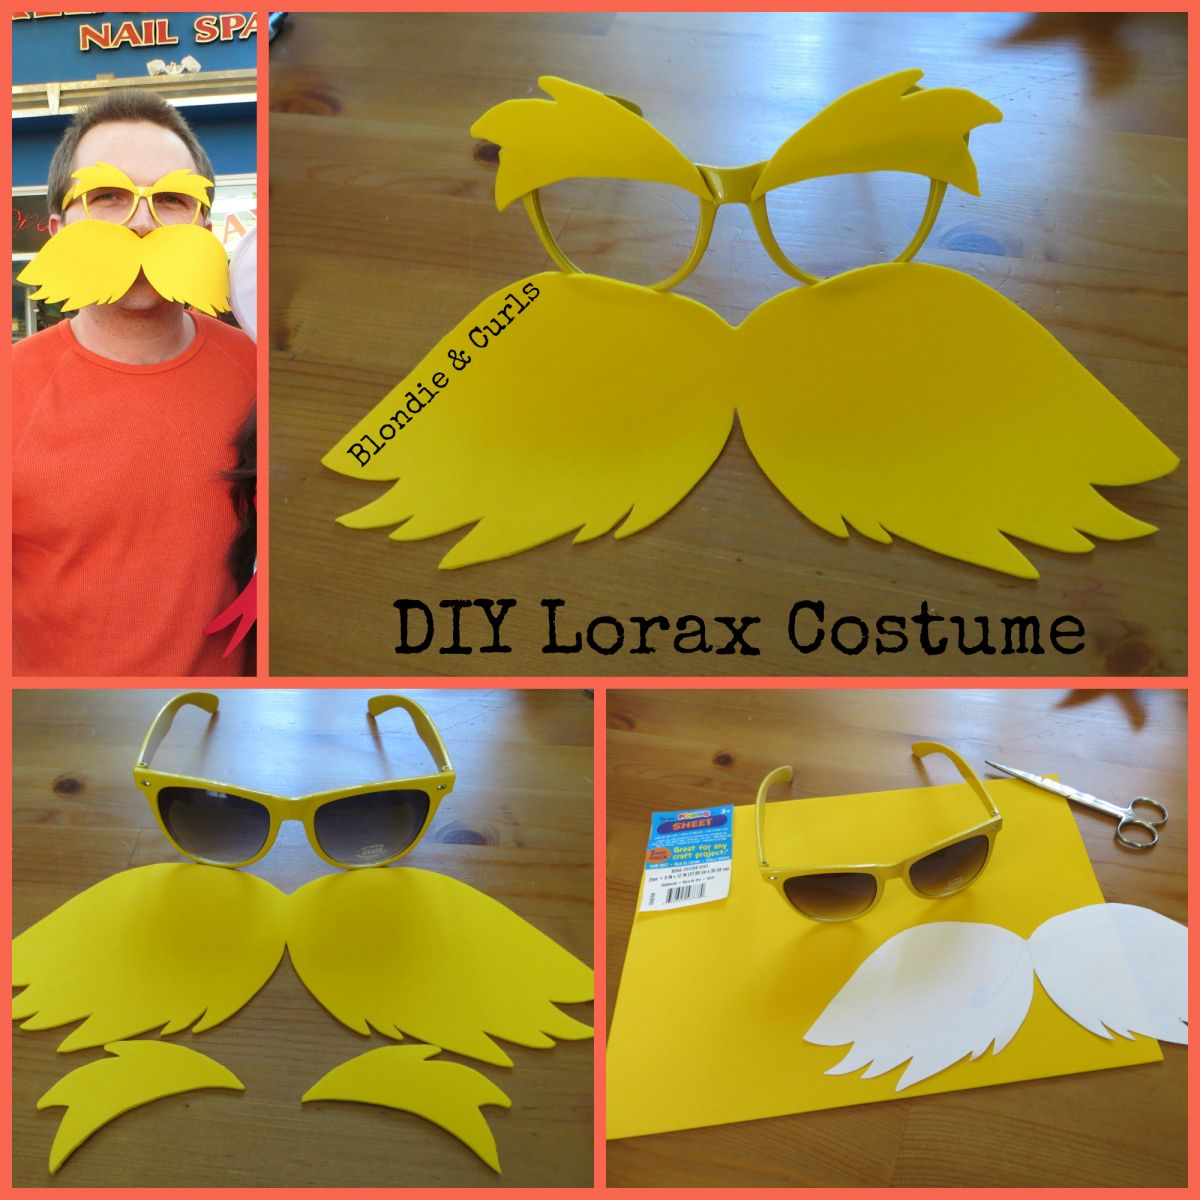 Diy lorax costume diy costumes lorax and costumes diy lorax costume solutioingenieria Gallery